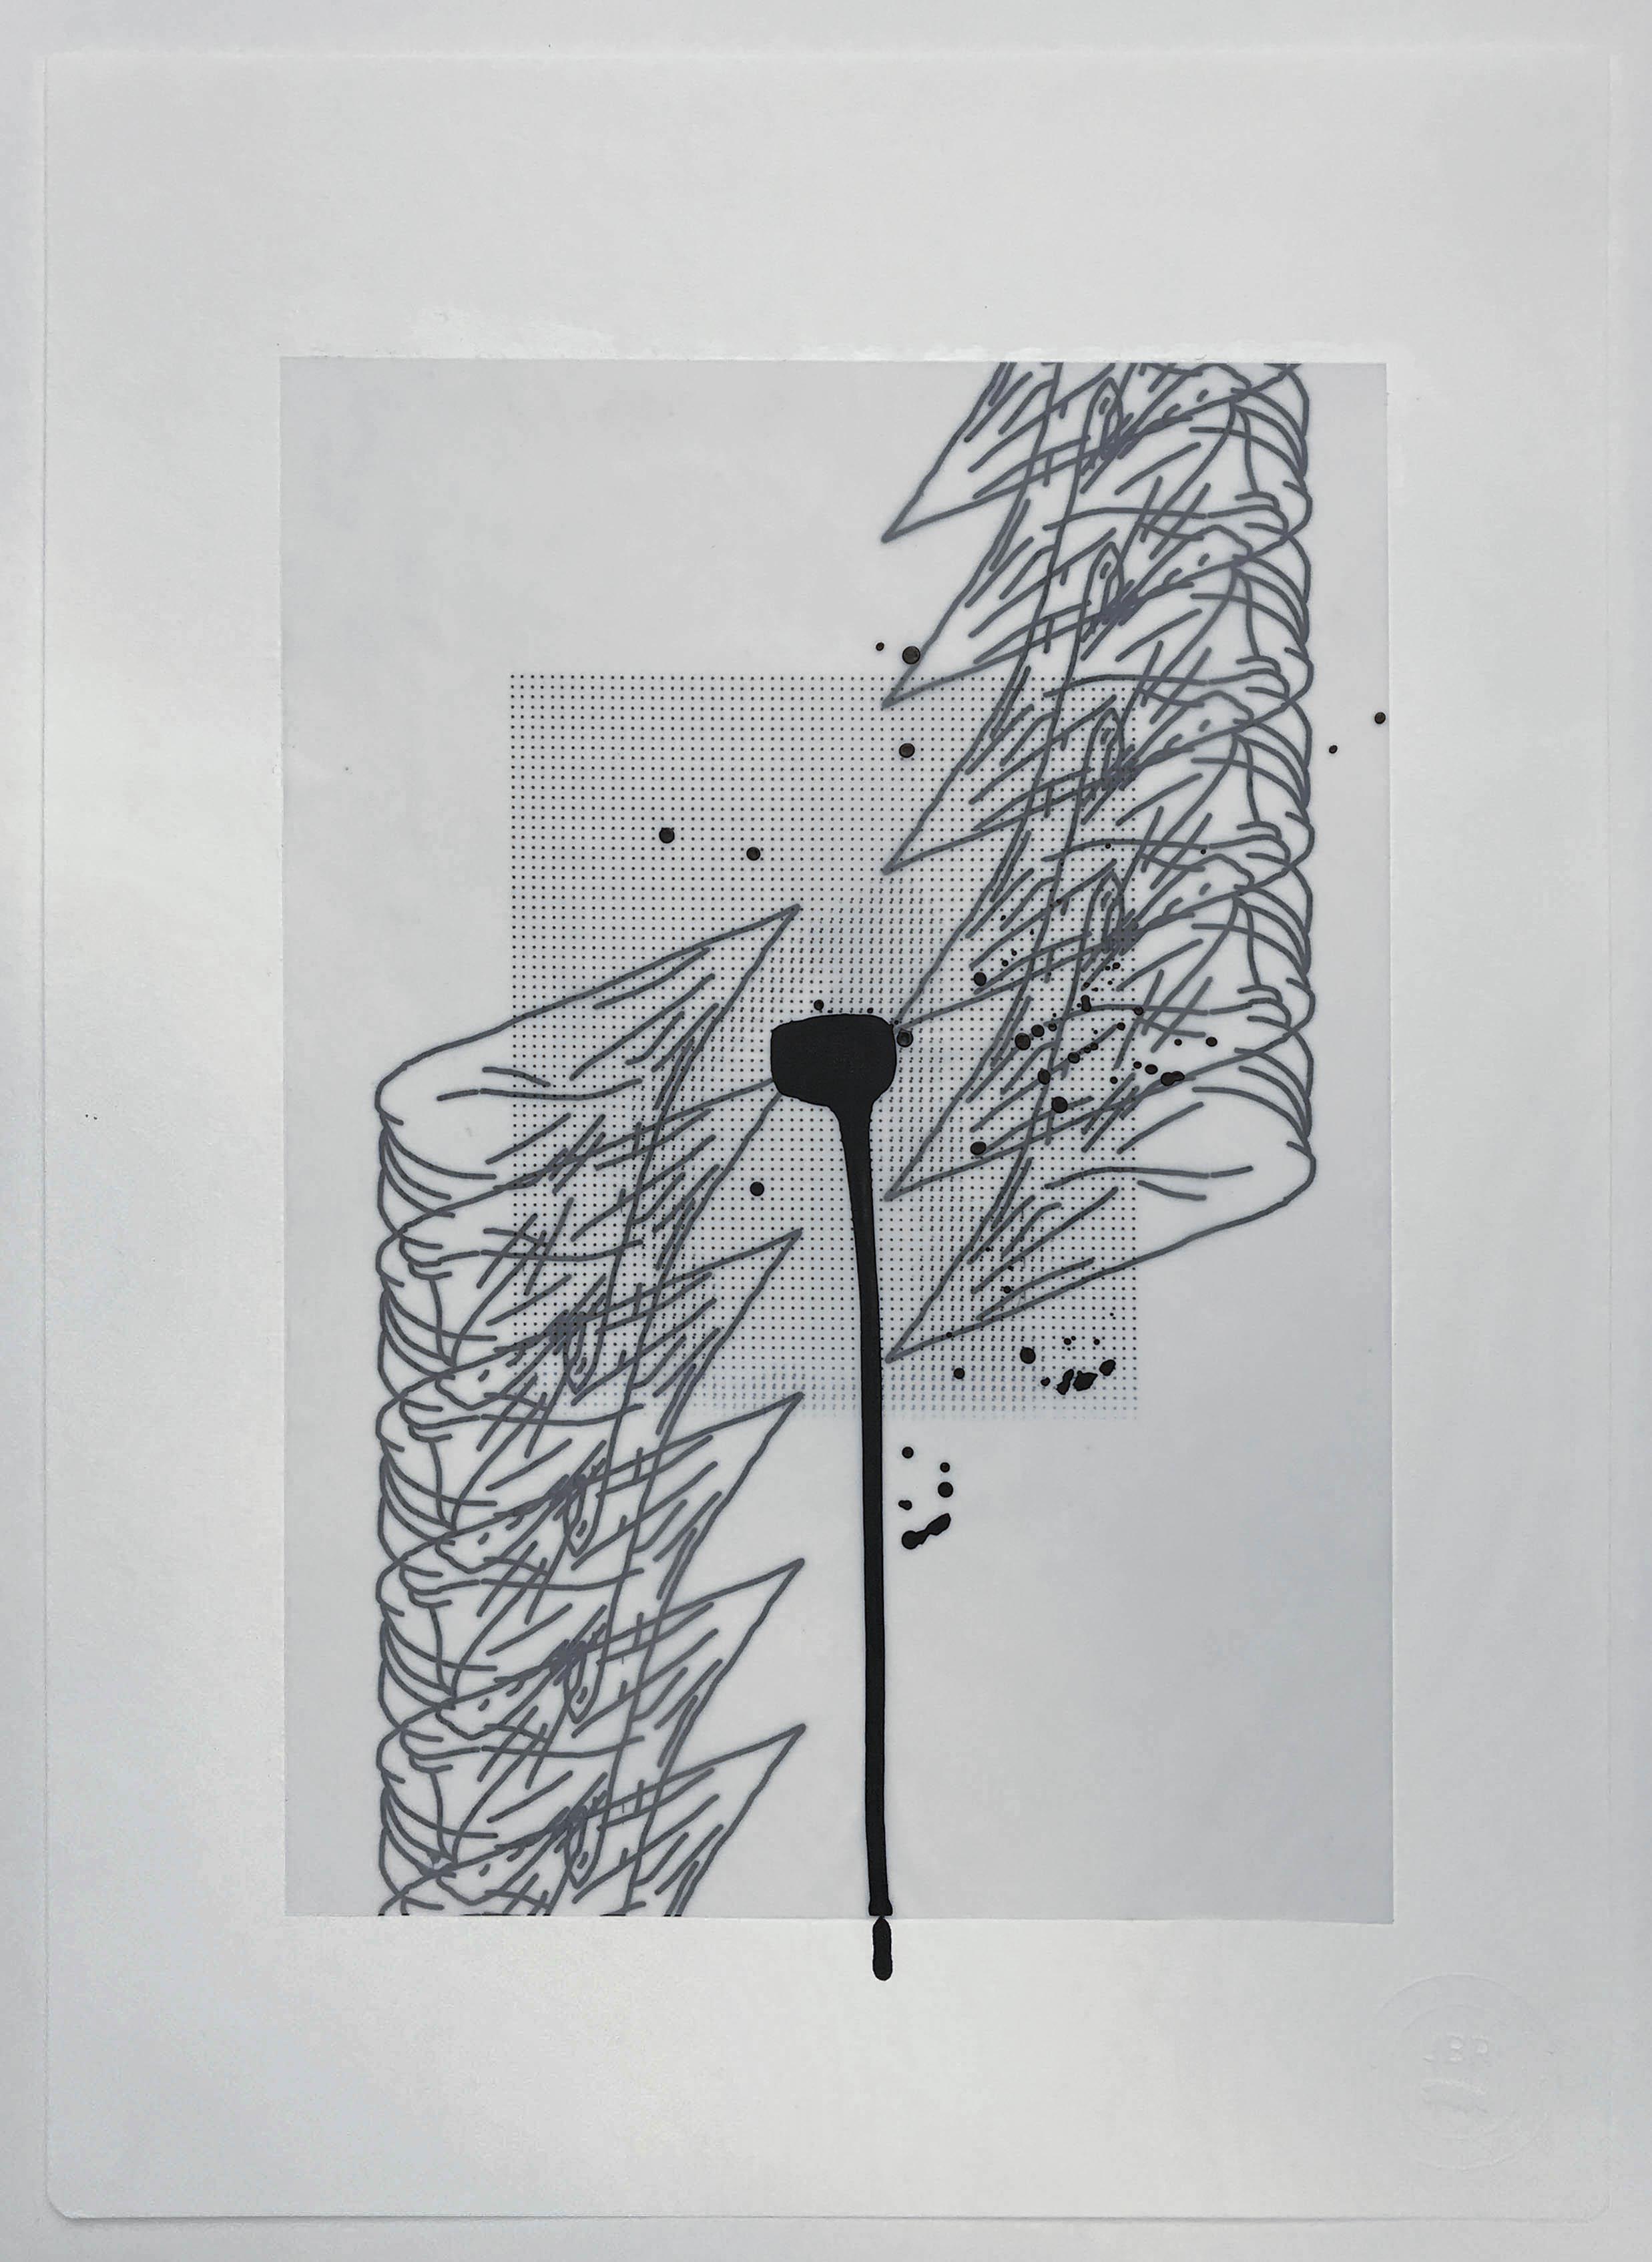 %22Entre fuego y agua%22- Técnica mixta  - 42 x 30 cm - Julián Brangold - 2018.jpg